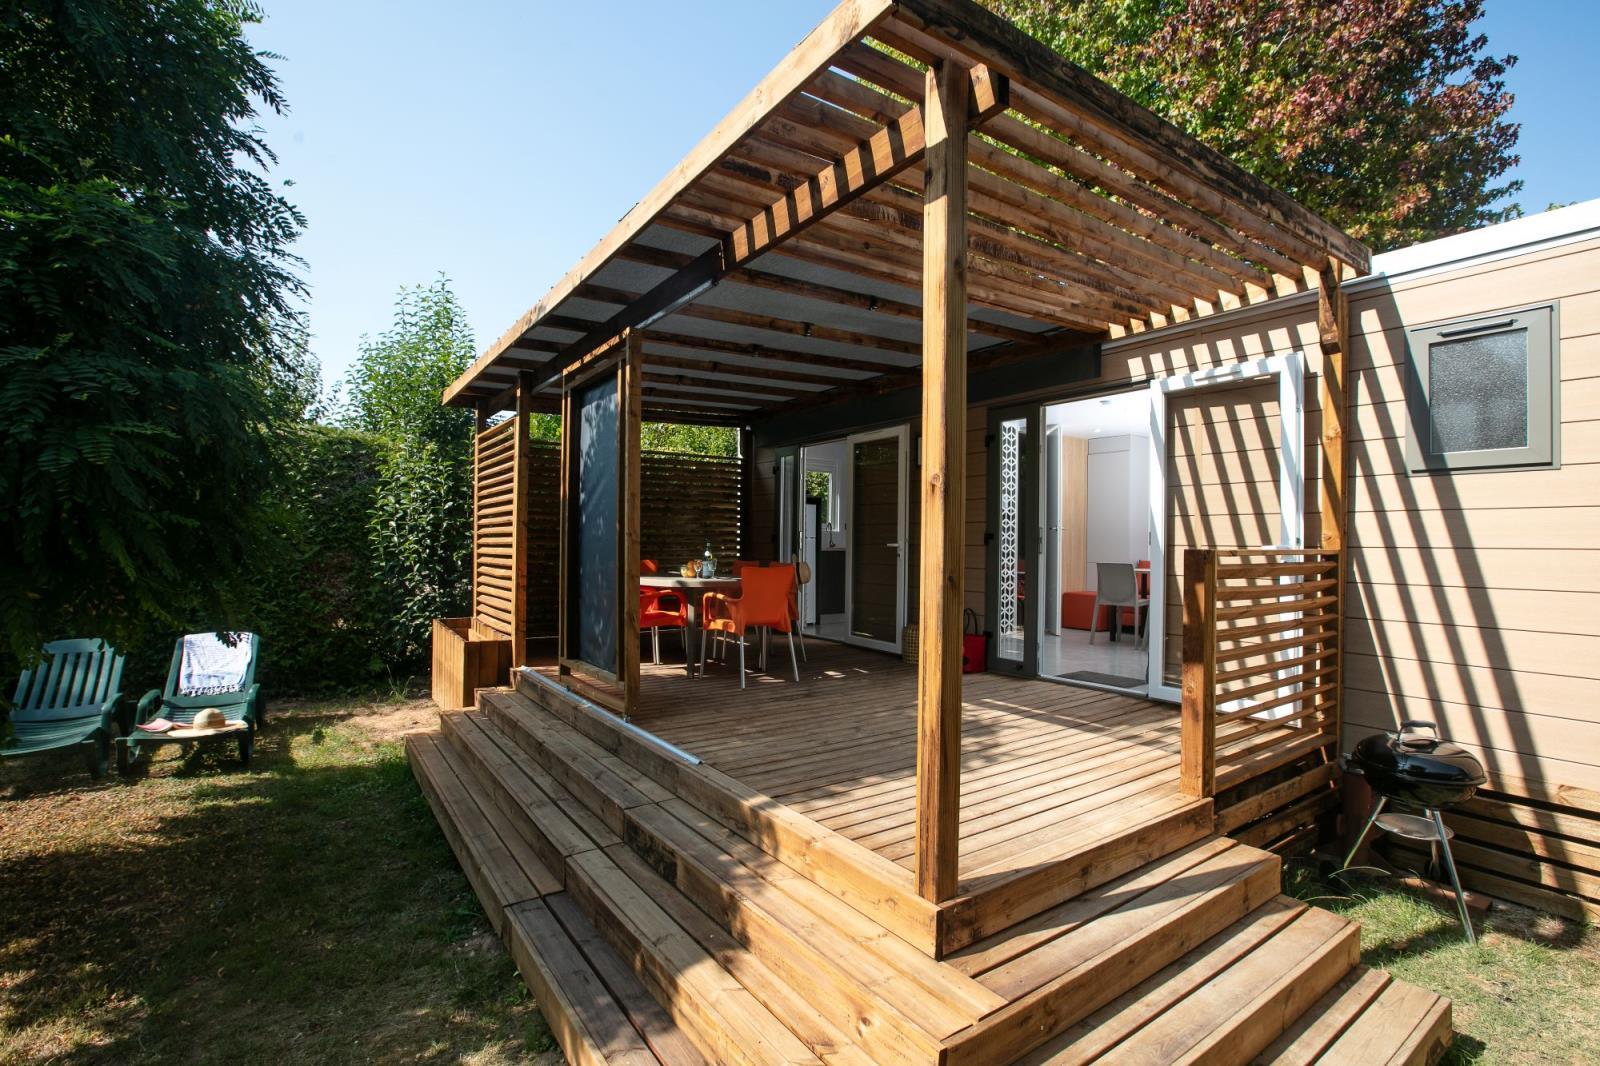 Location - Cottage Confort Plus 2 Chambres - Camping Le Paradis